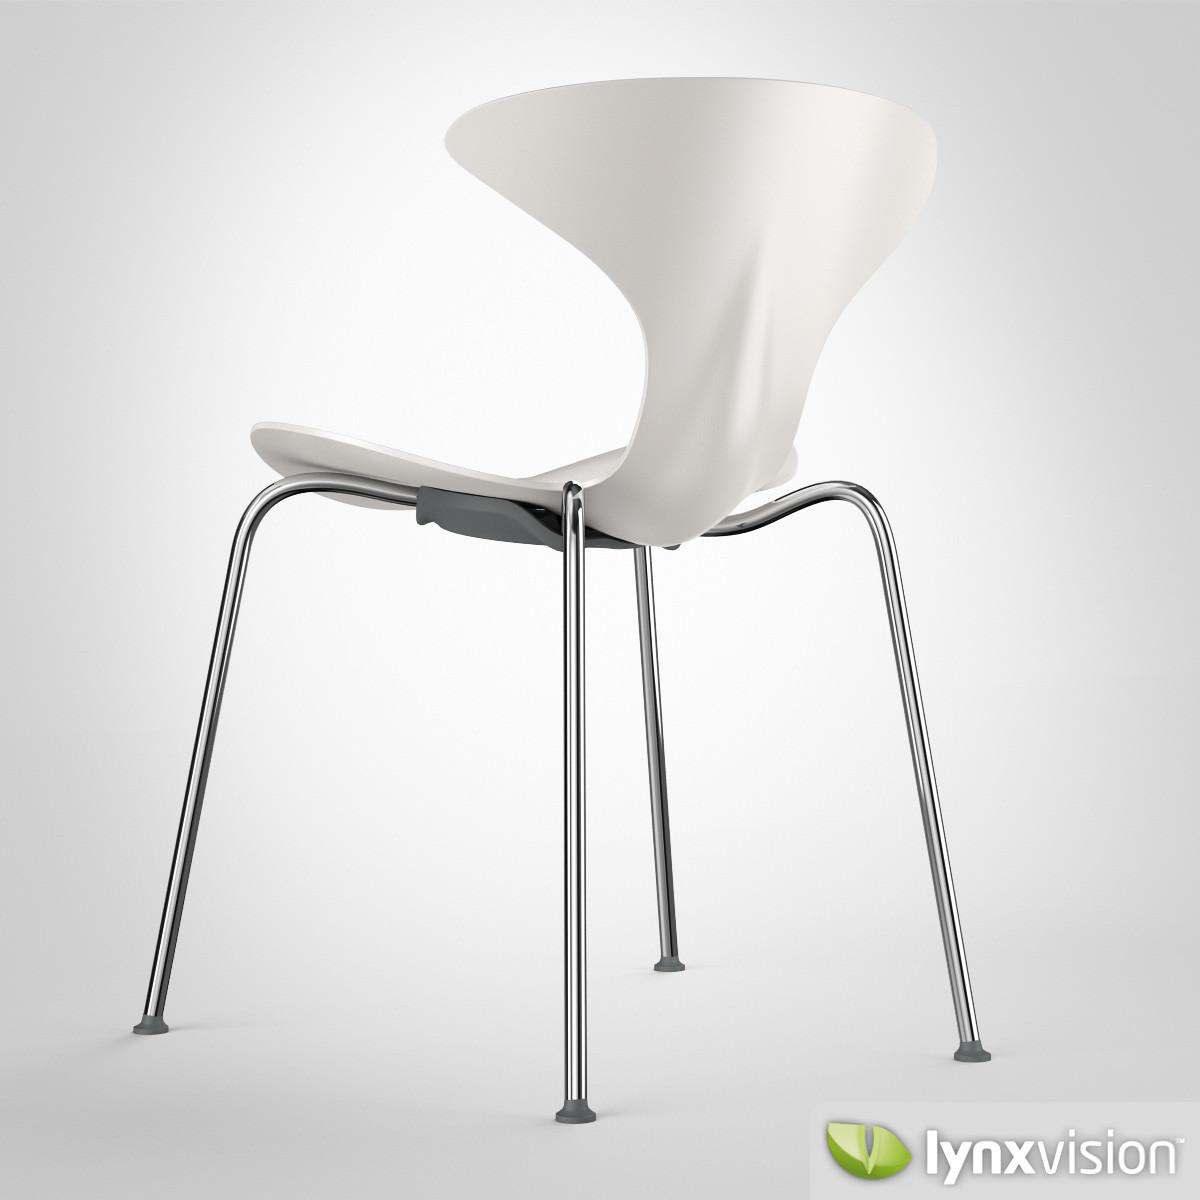 Orbit Chair by Ross Lovegrove 3D Model x obj fbx